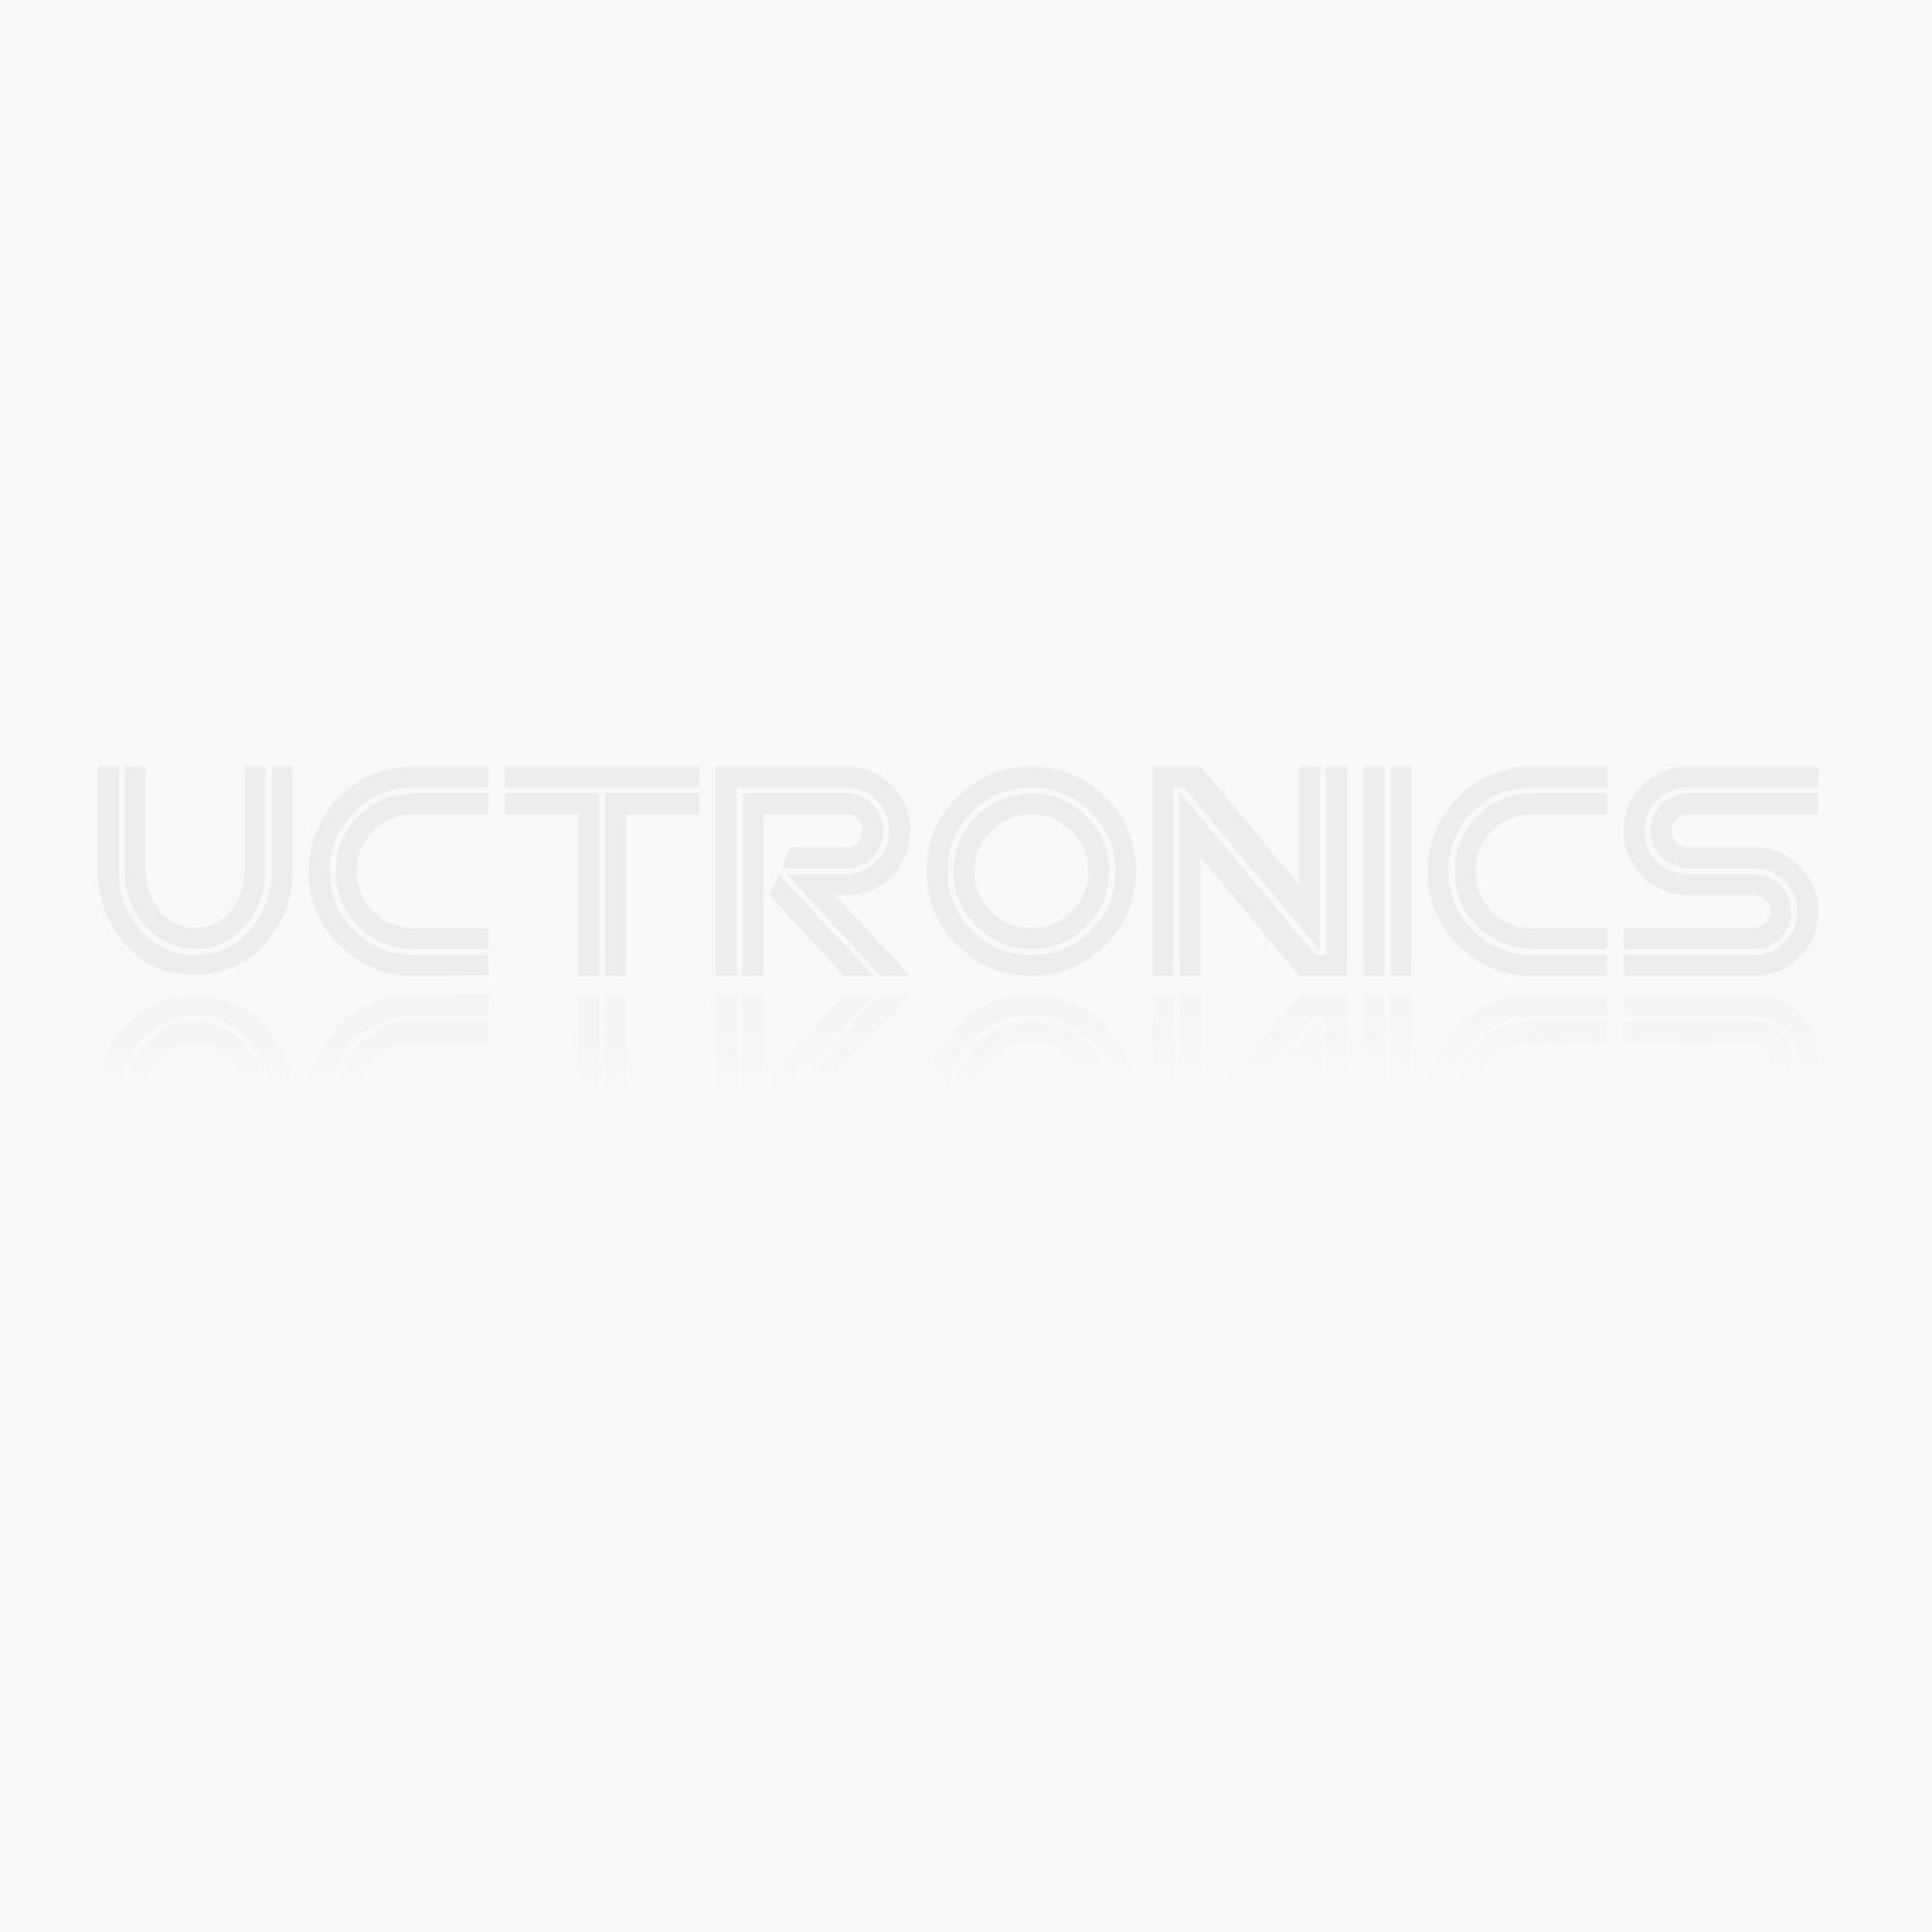 IC2262/2272 4 Channel 433Mhz Wireless Receiver Module /w 4 Keys Remote Control